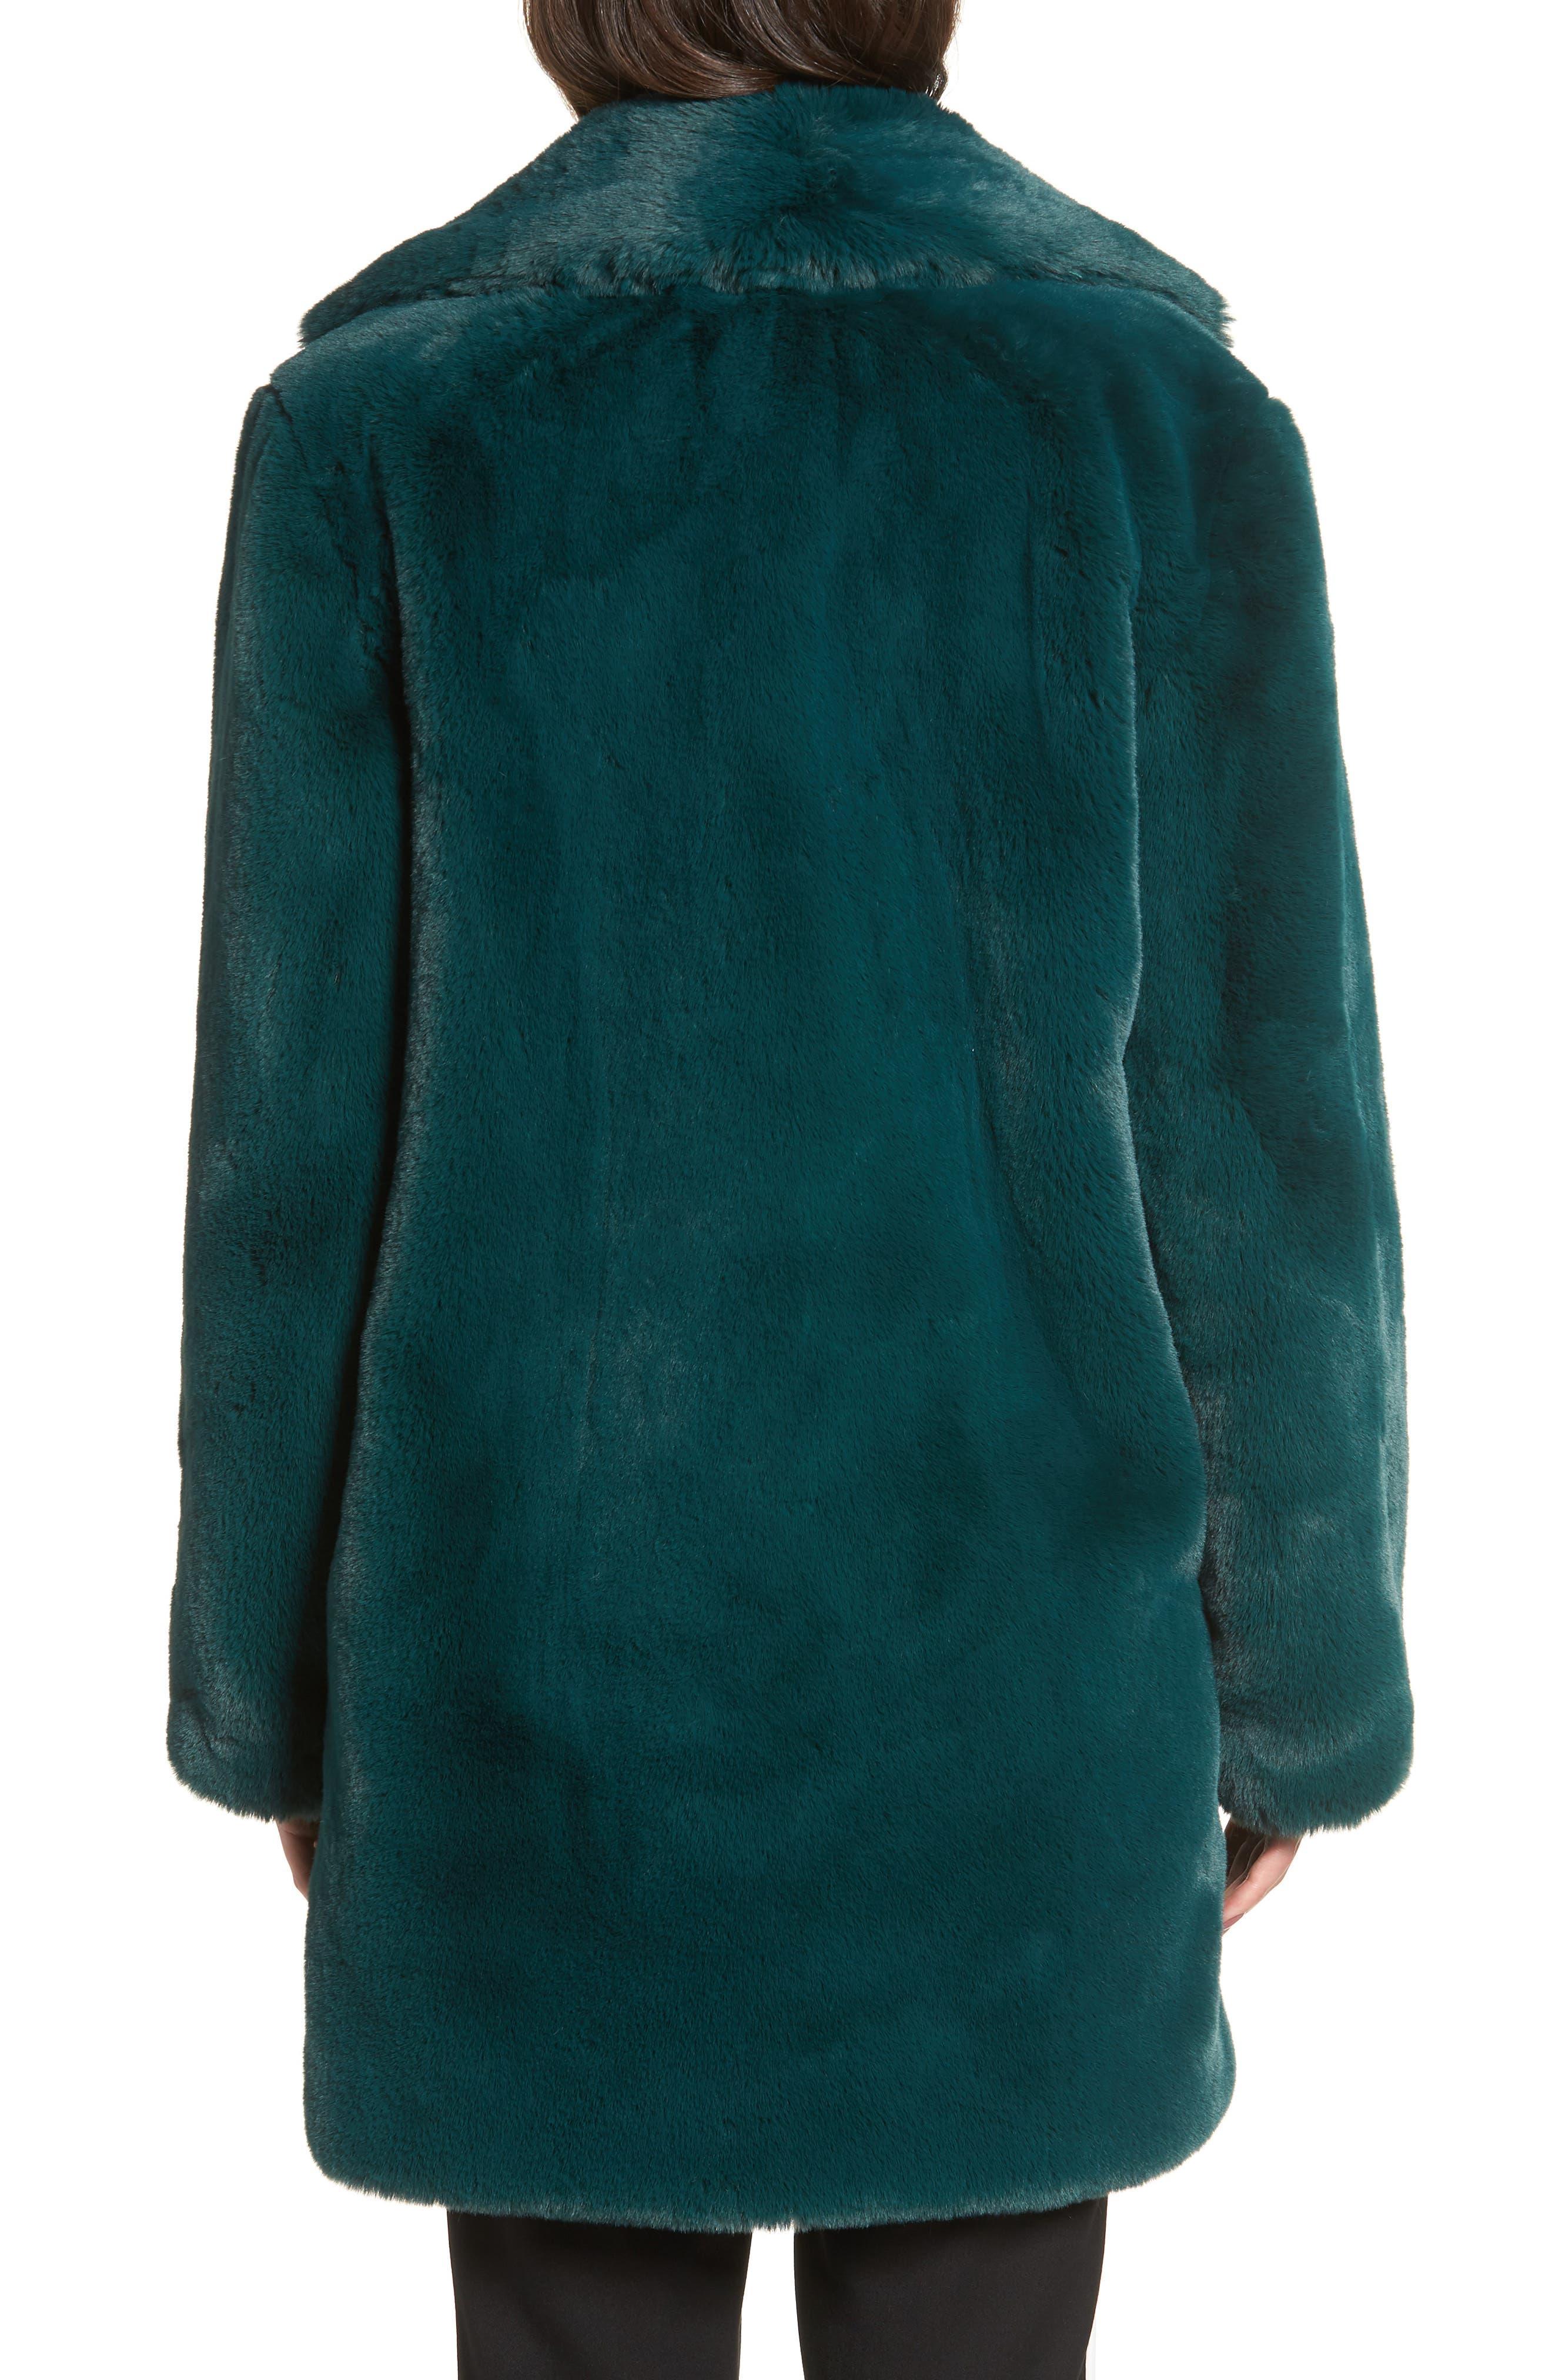 Dreaming Faux Fur Coat,                             Alternate thumbnail 2, color,                             300